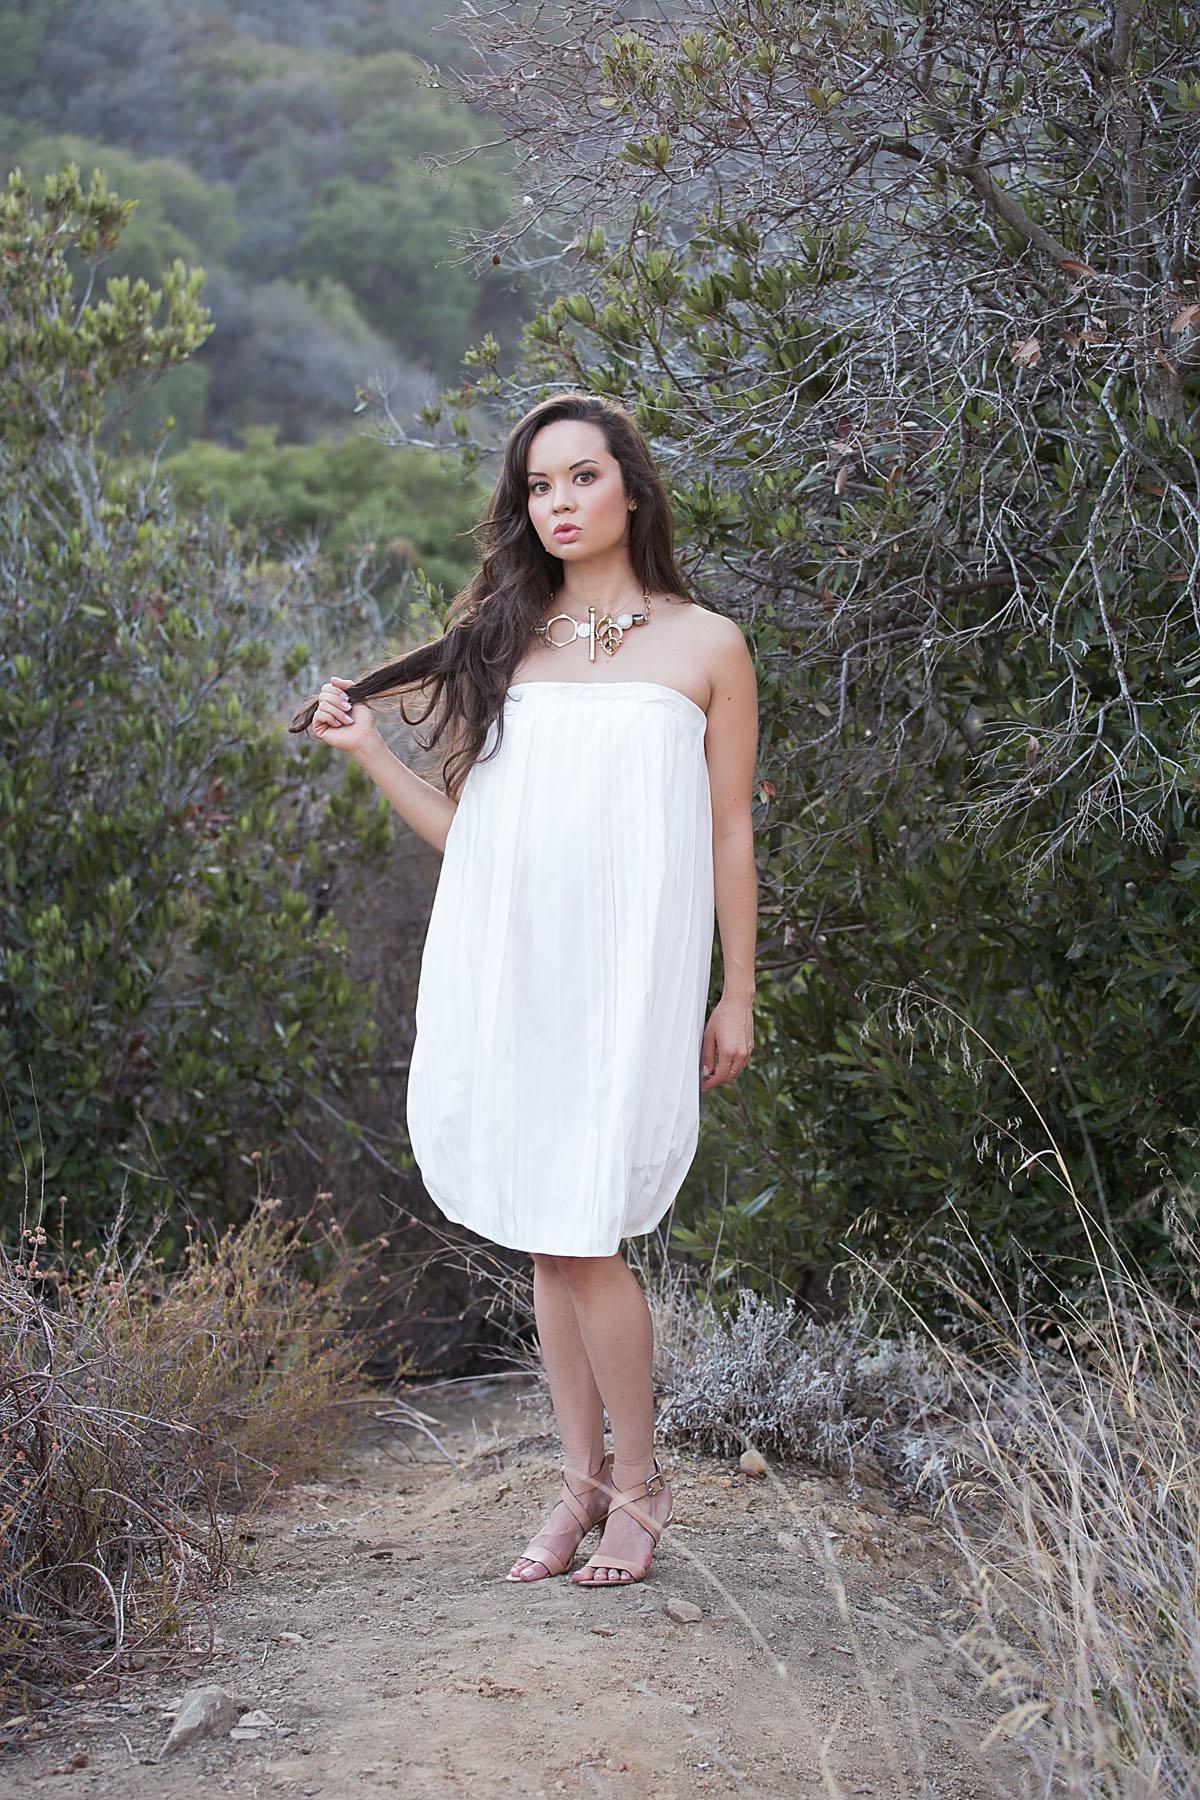 the la survival guide, los angeles fashion, fashion blog, style blog, la style, la model, jil sander dress, michael kors heels, kelly wearstler necklace, mandeville canyon